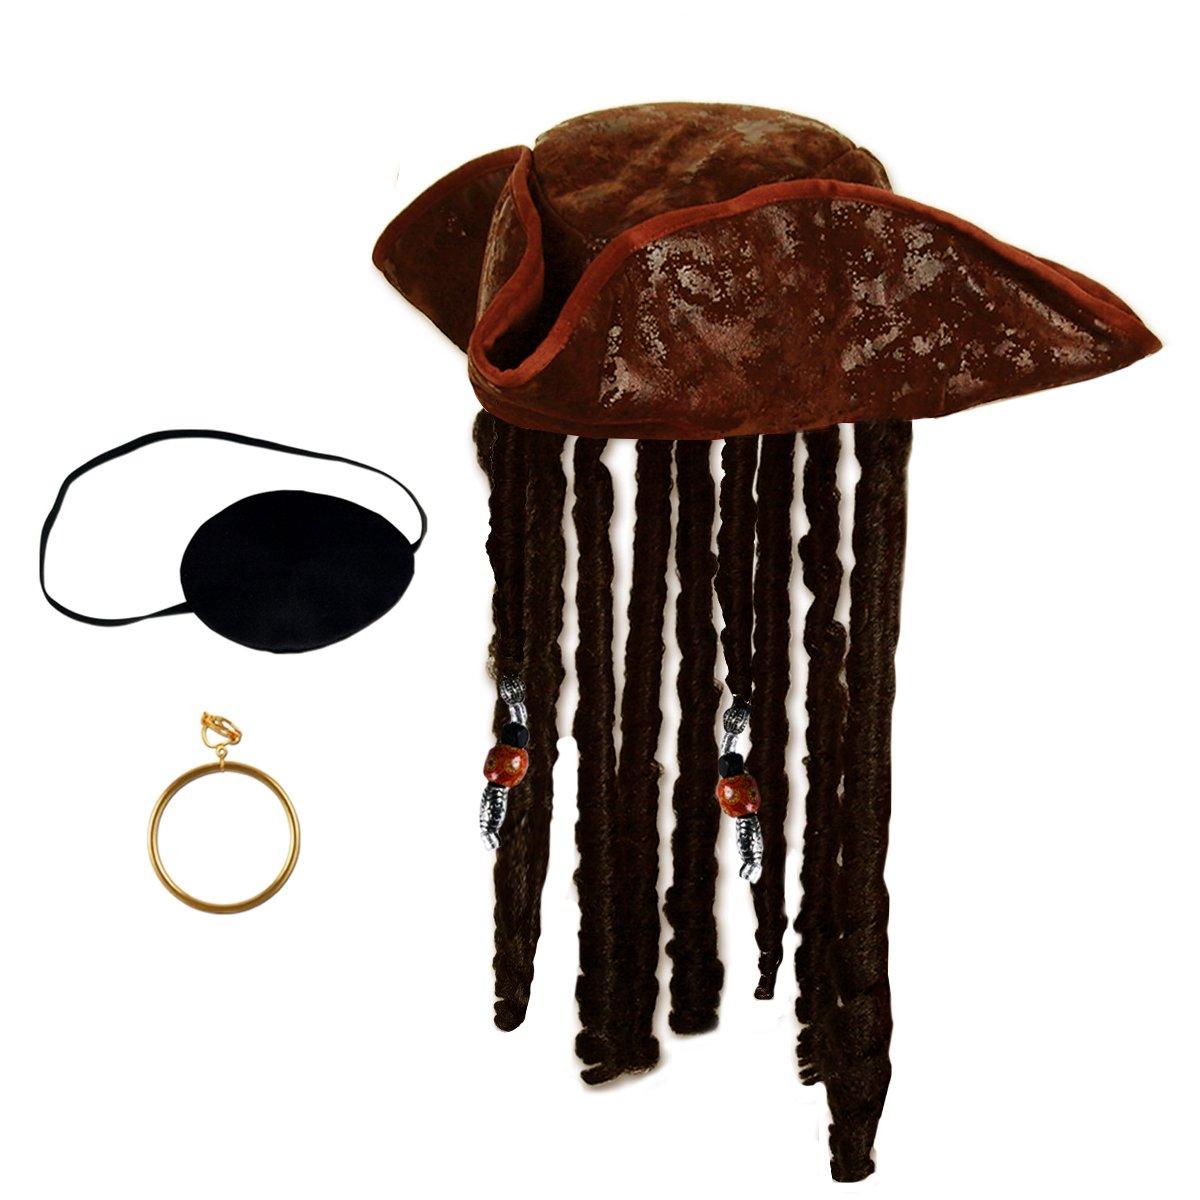 Tigerdoe Pirate Hat with Dreadlocks - Tricorn Pirate Hat - Caribbean Pirate Hat - Pirate Costume Accessories (3 Piece Set) f-tg095